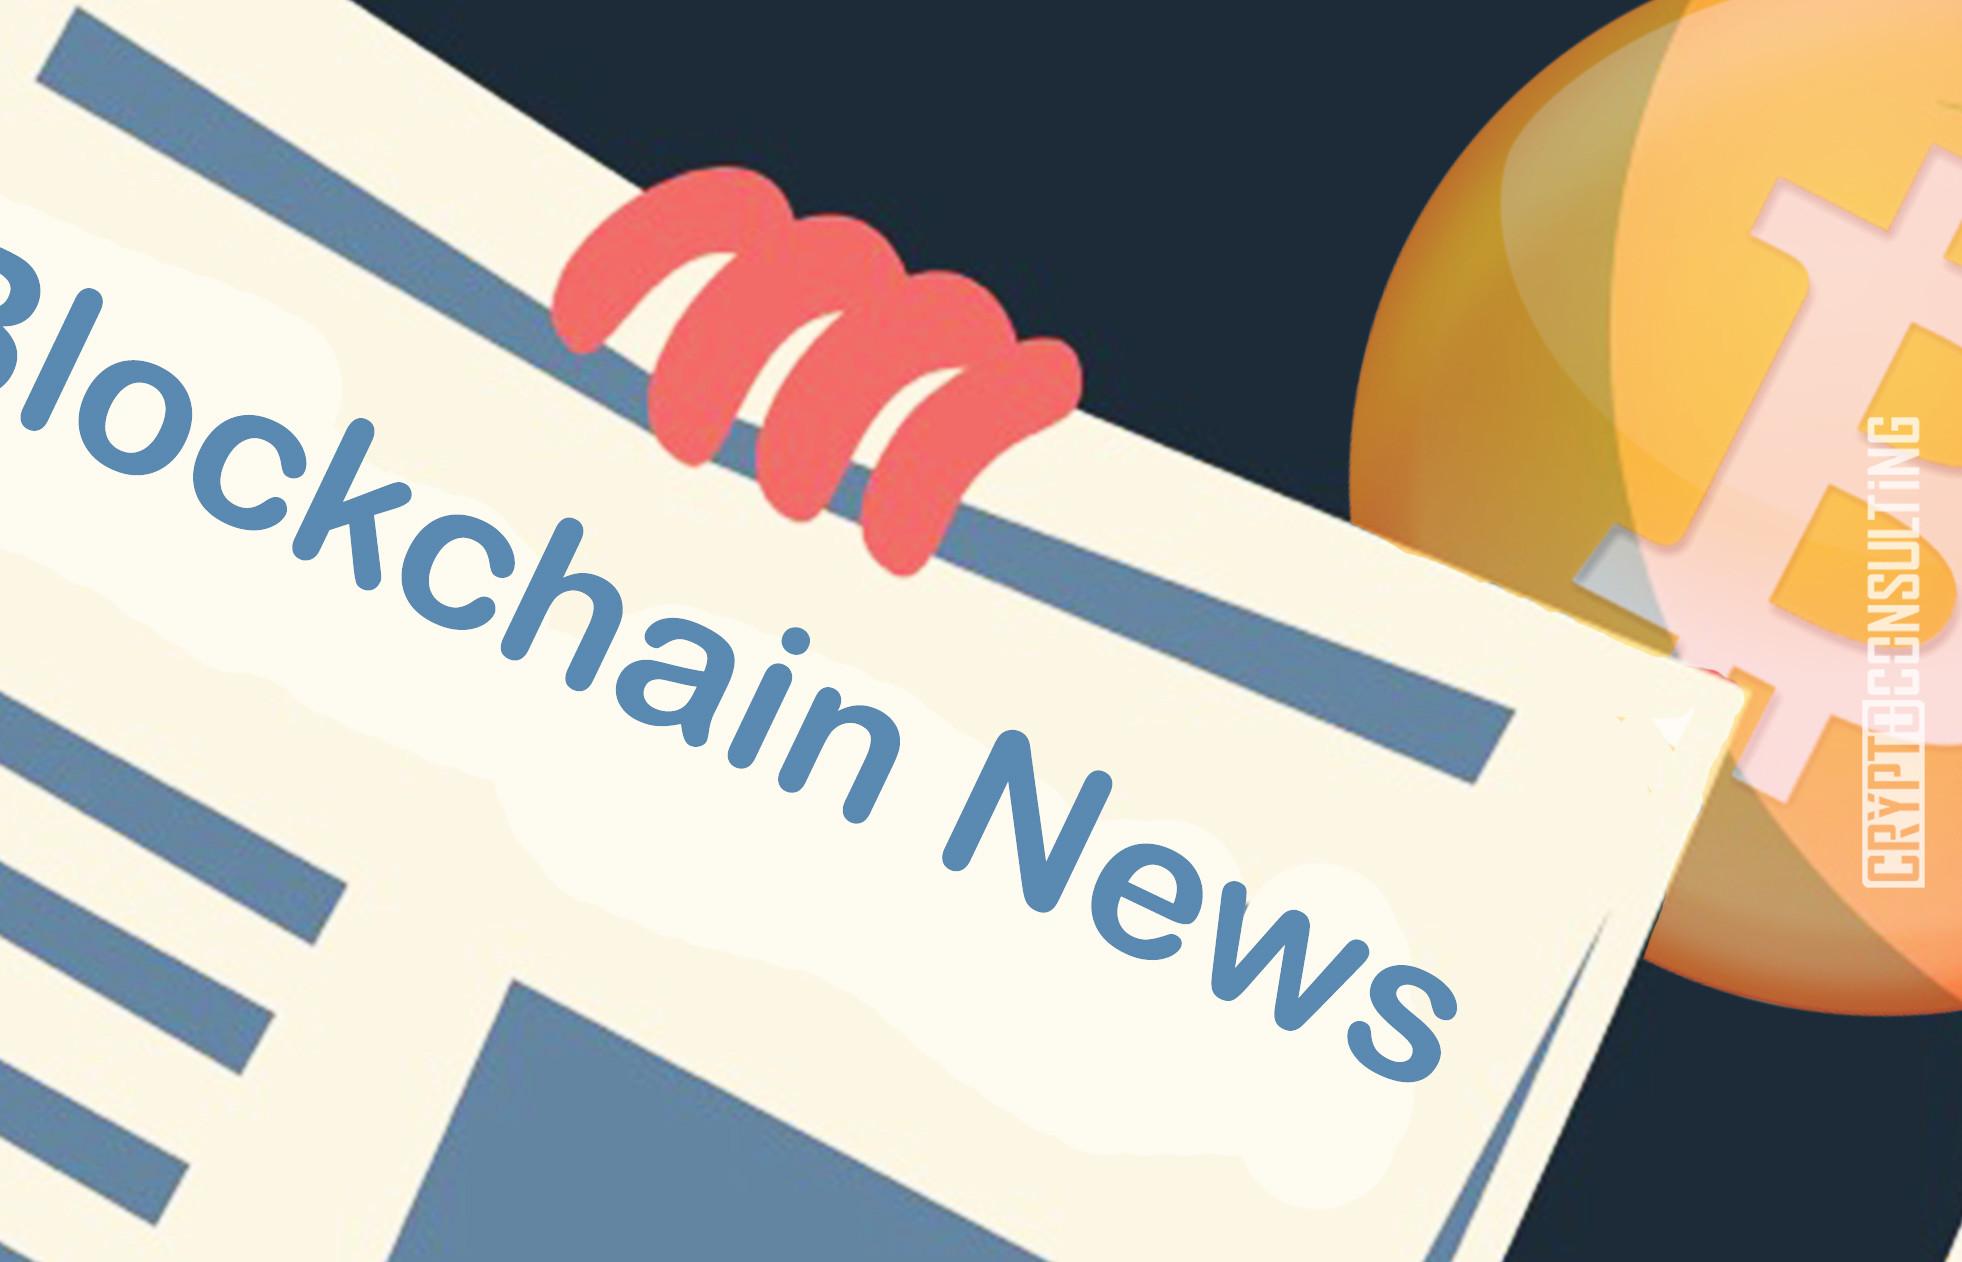 tin-tuc-blockchain.jpg